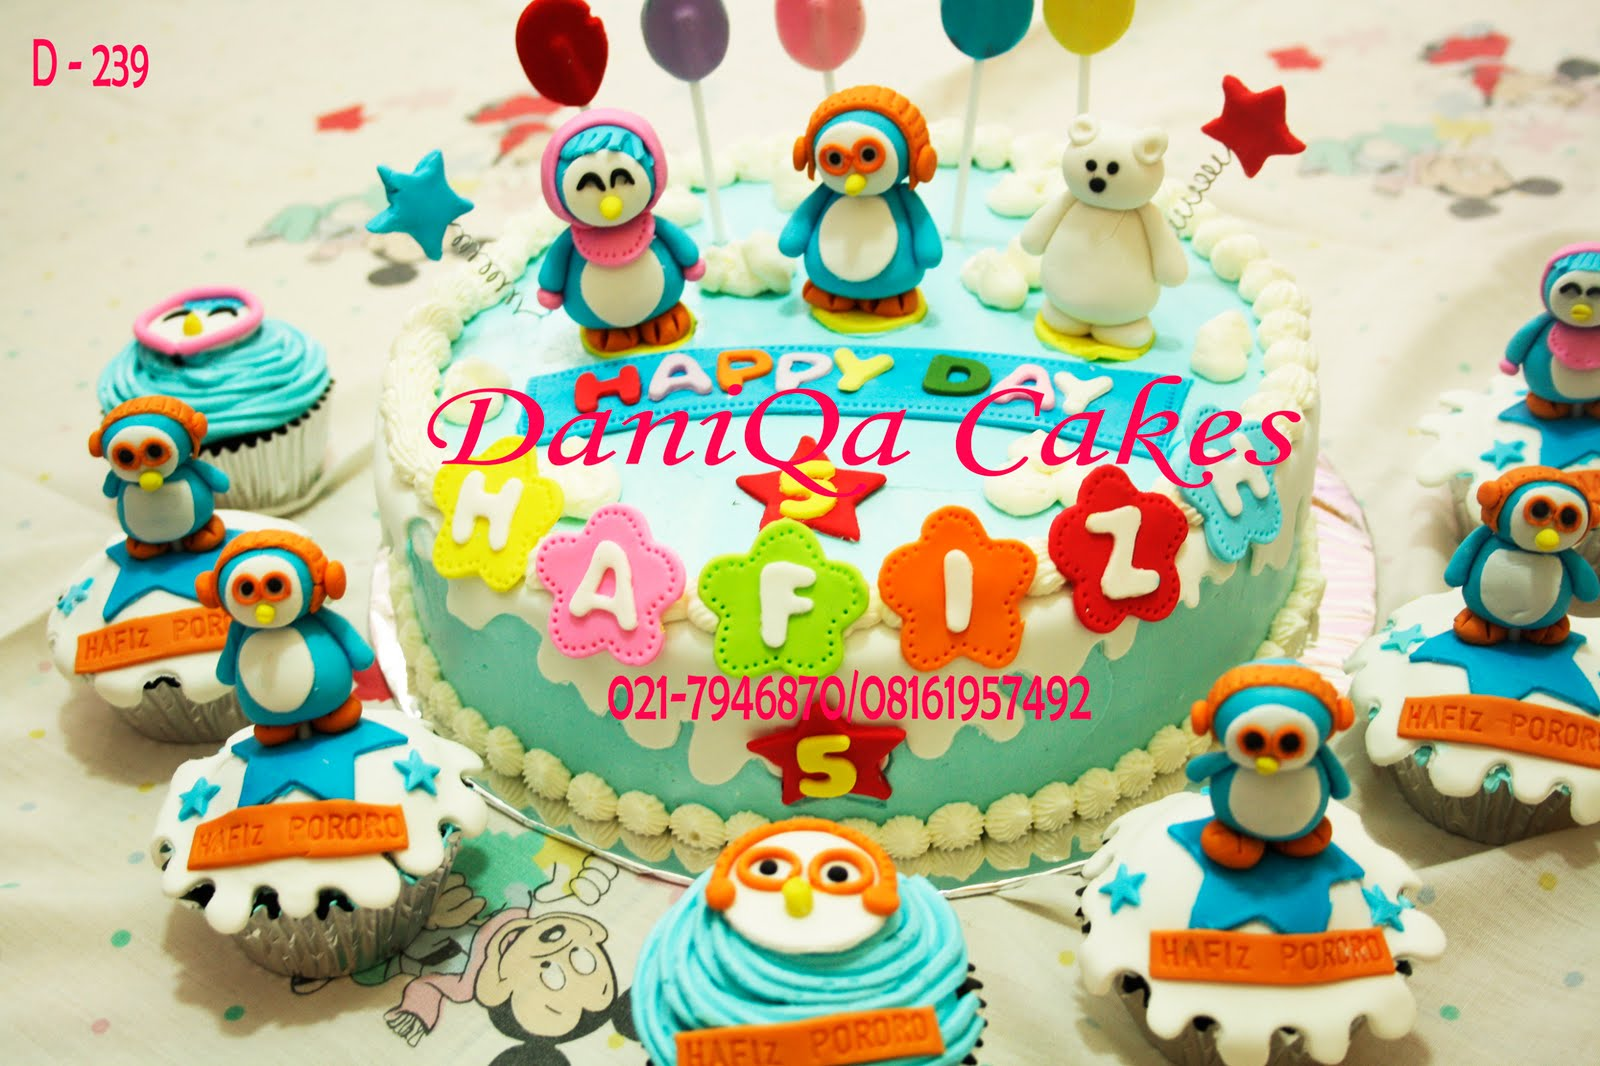 Image Kue Ulang Tahun Lucu : Pin Tas Goody Bag Cake on Pinterest